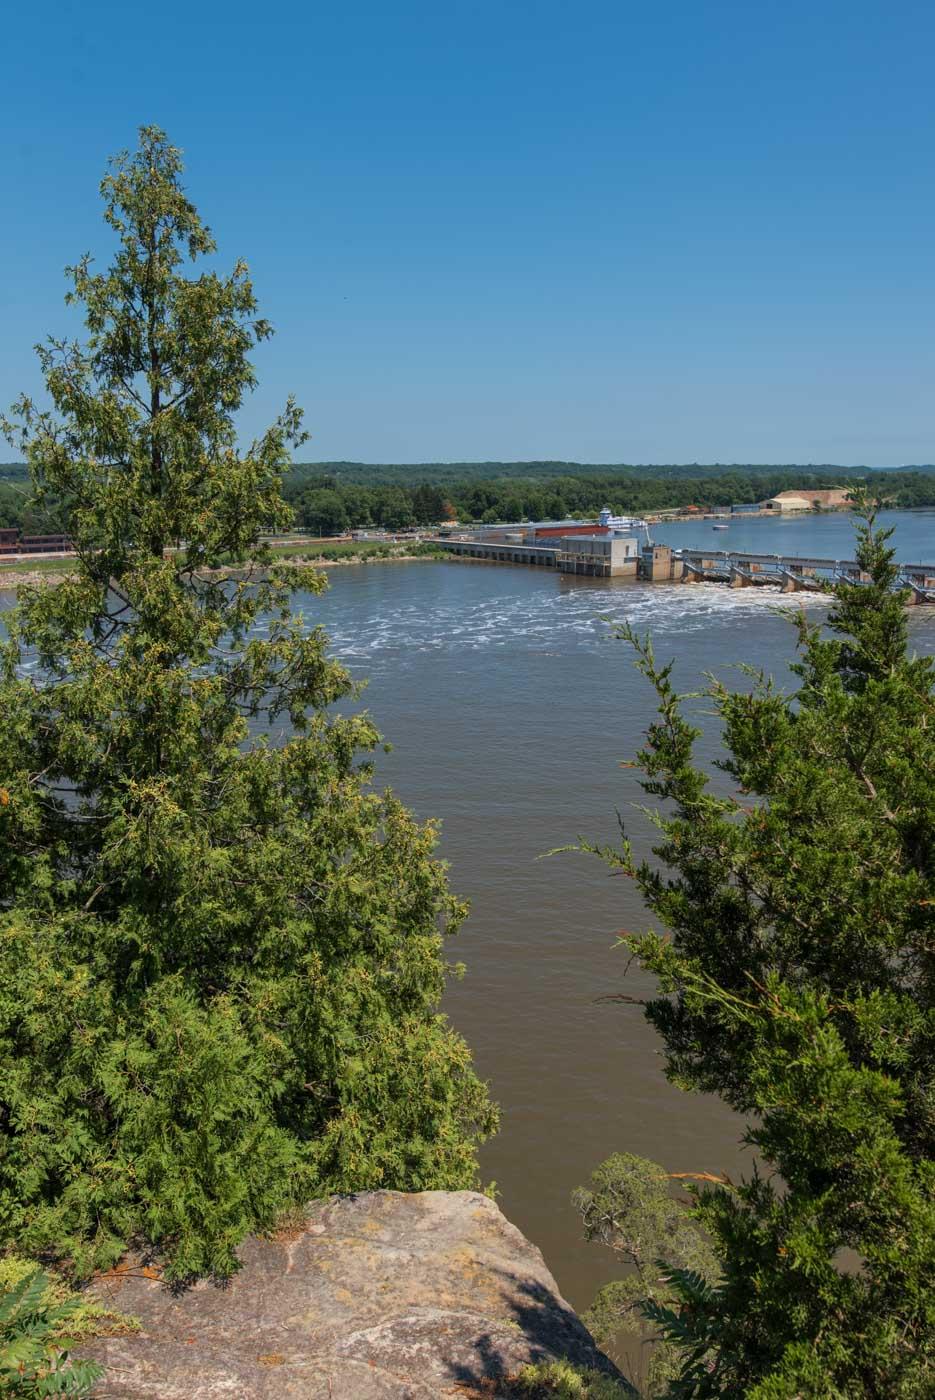 Lock and dam at Utica, IL, on the Illinois River